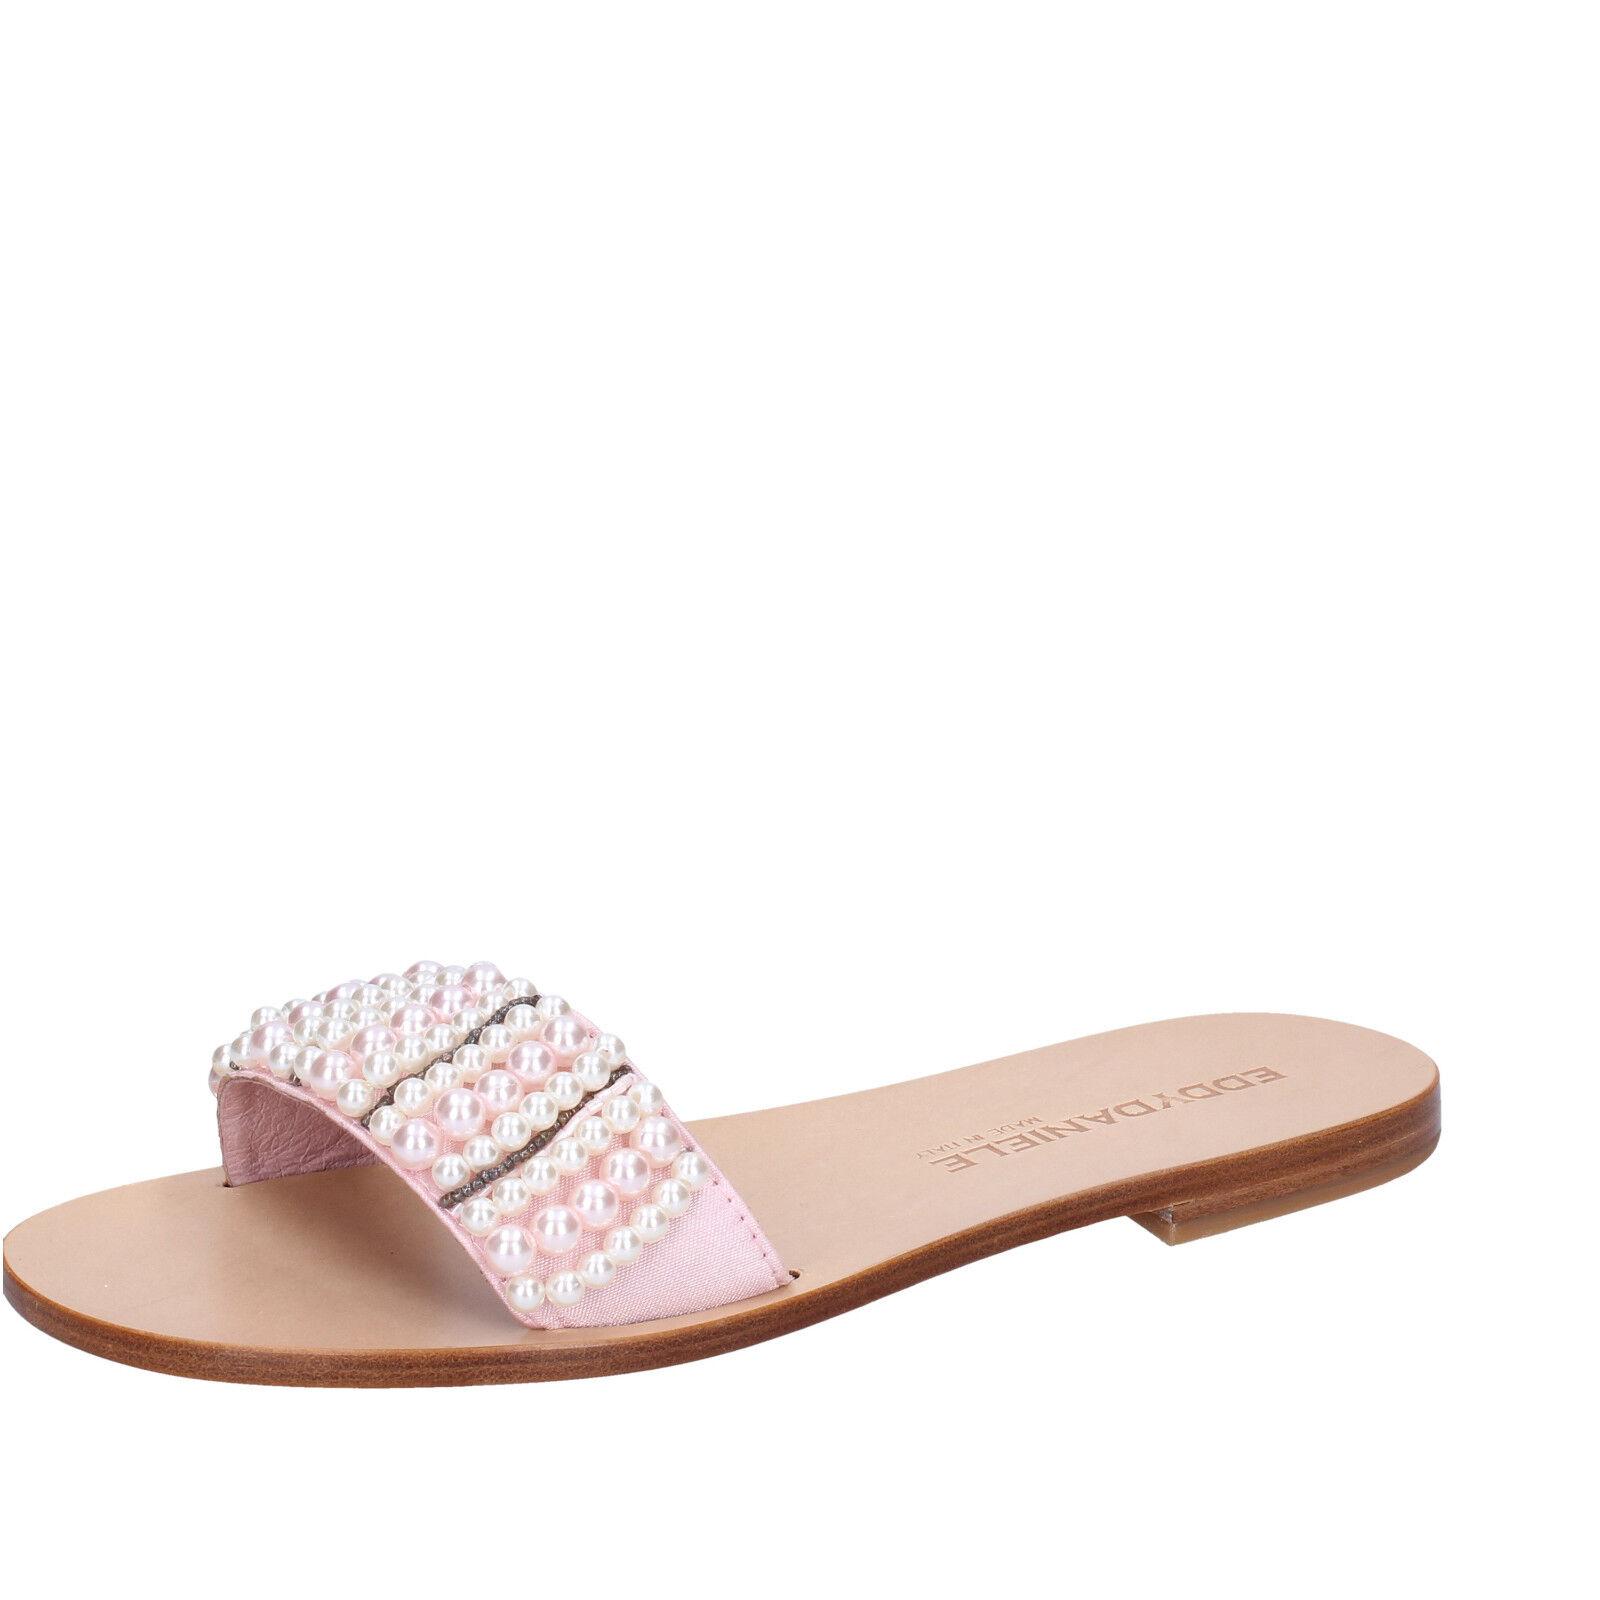 Women's shoes EDDY DANIELE 7 (EU 37) sandals pink textile AW265-37